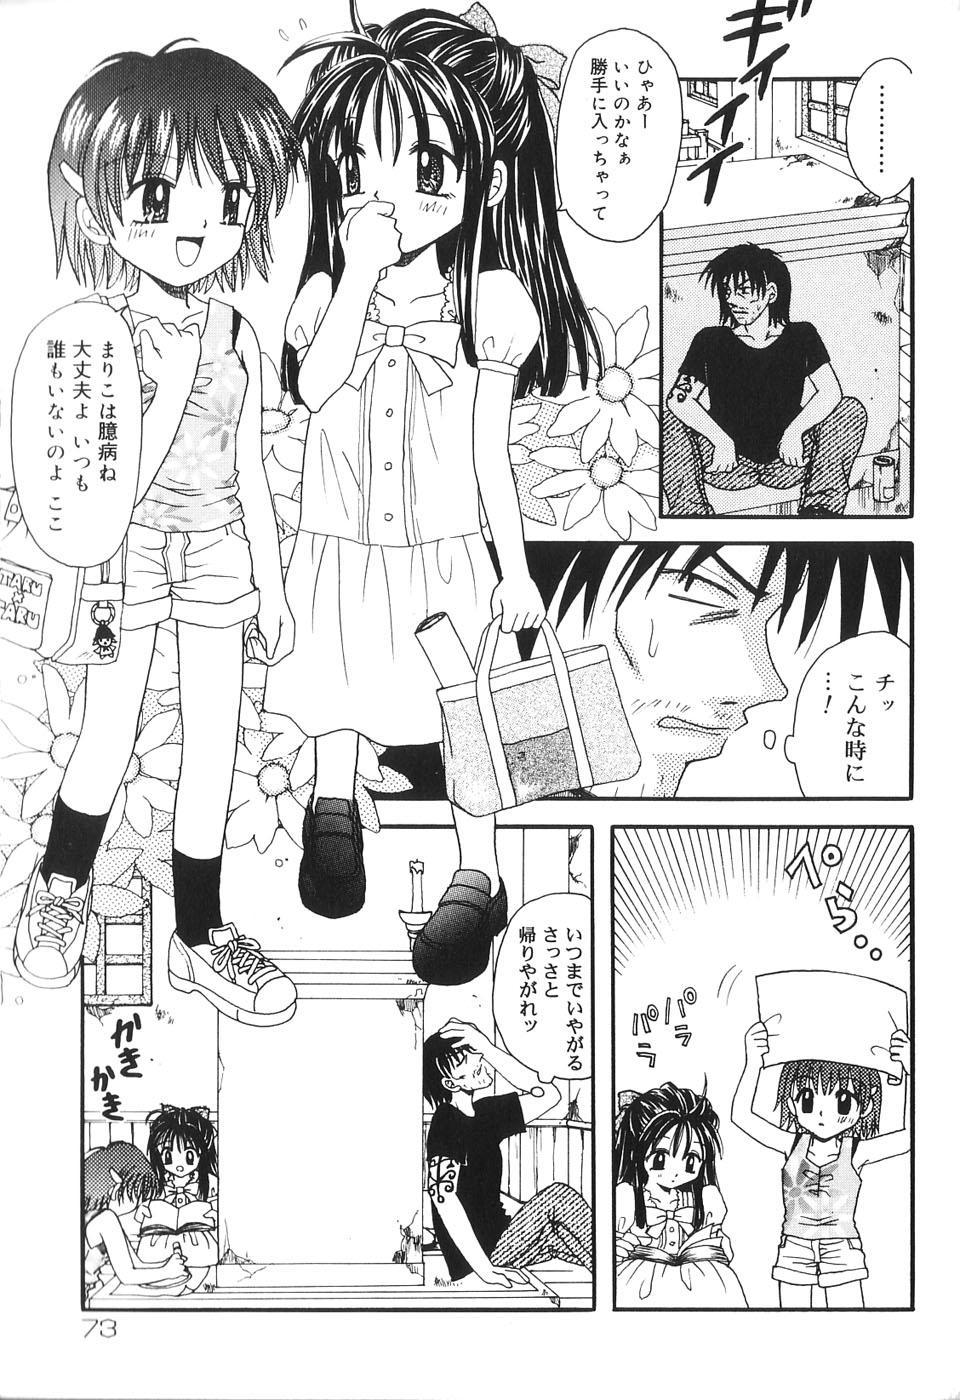 Musoubana 75